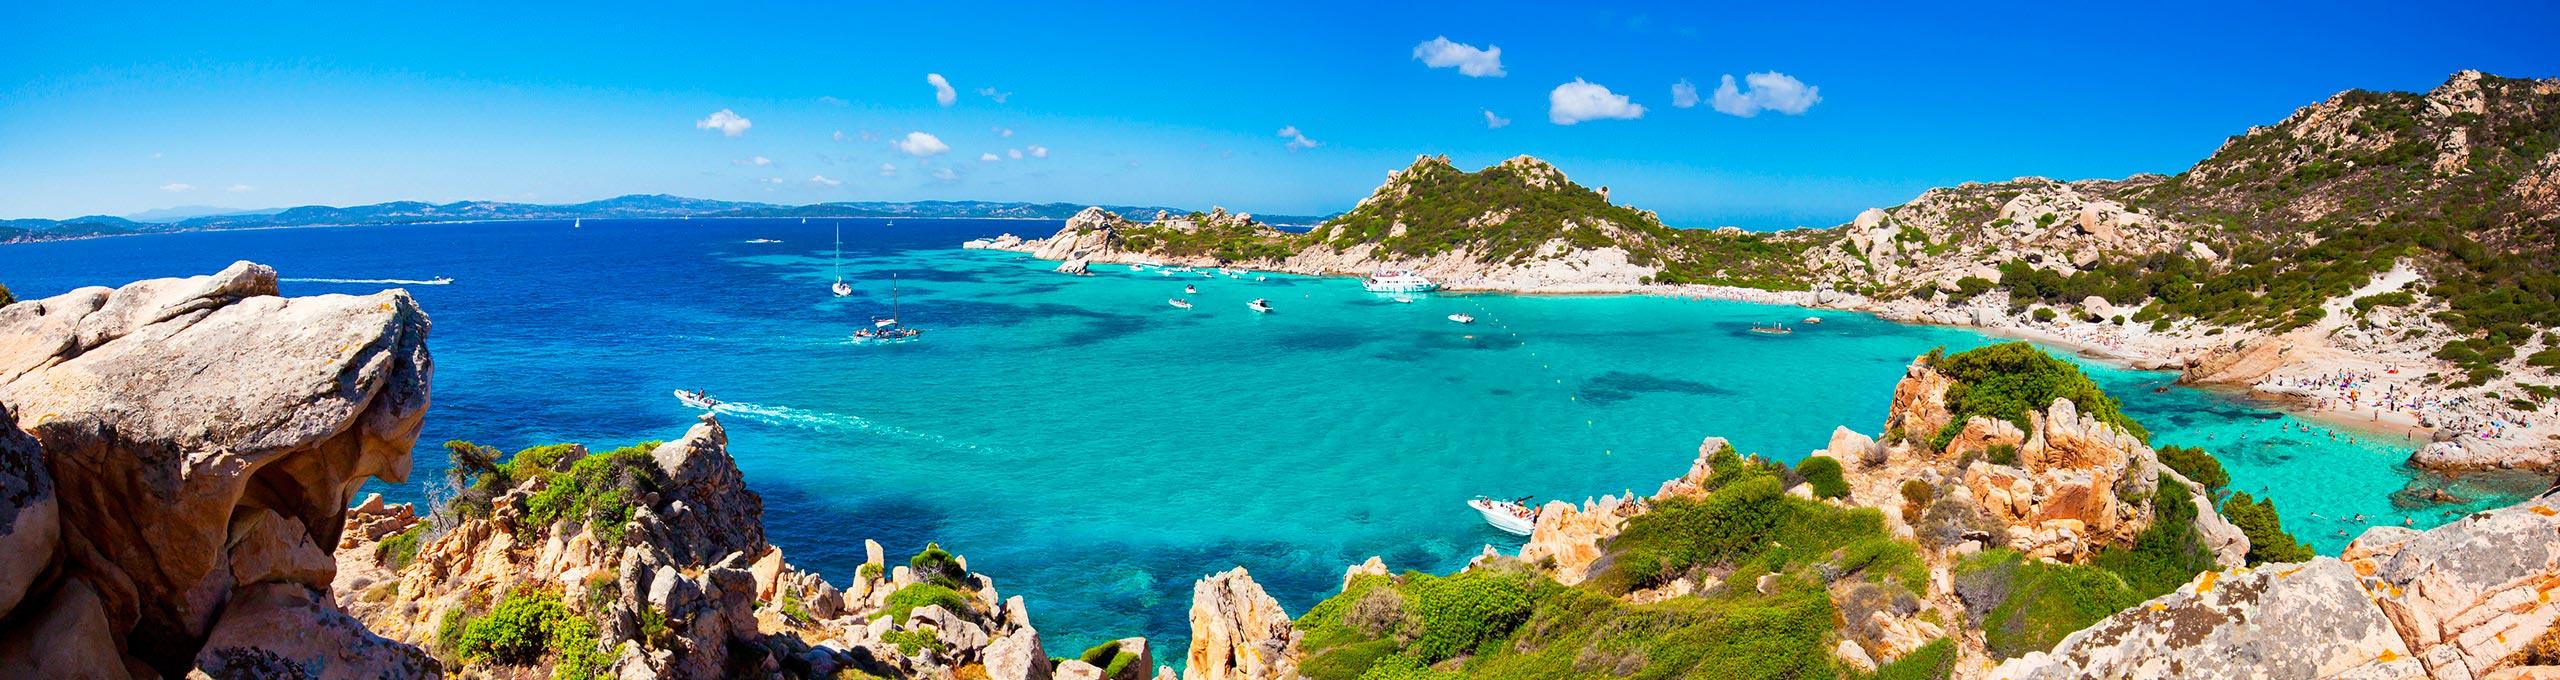 Isola Spargi, Sardegna